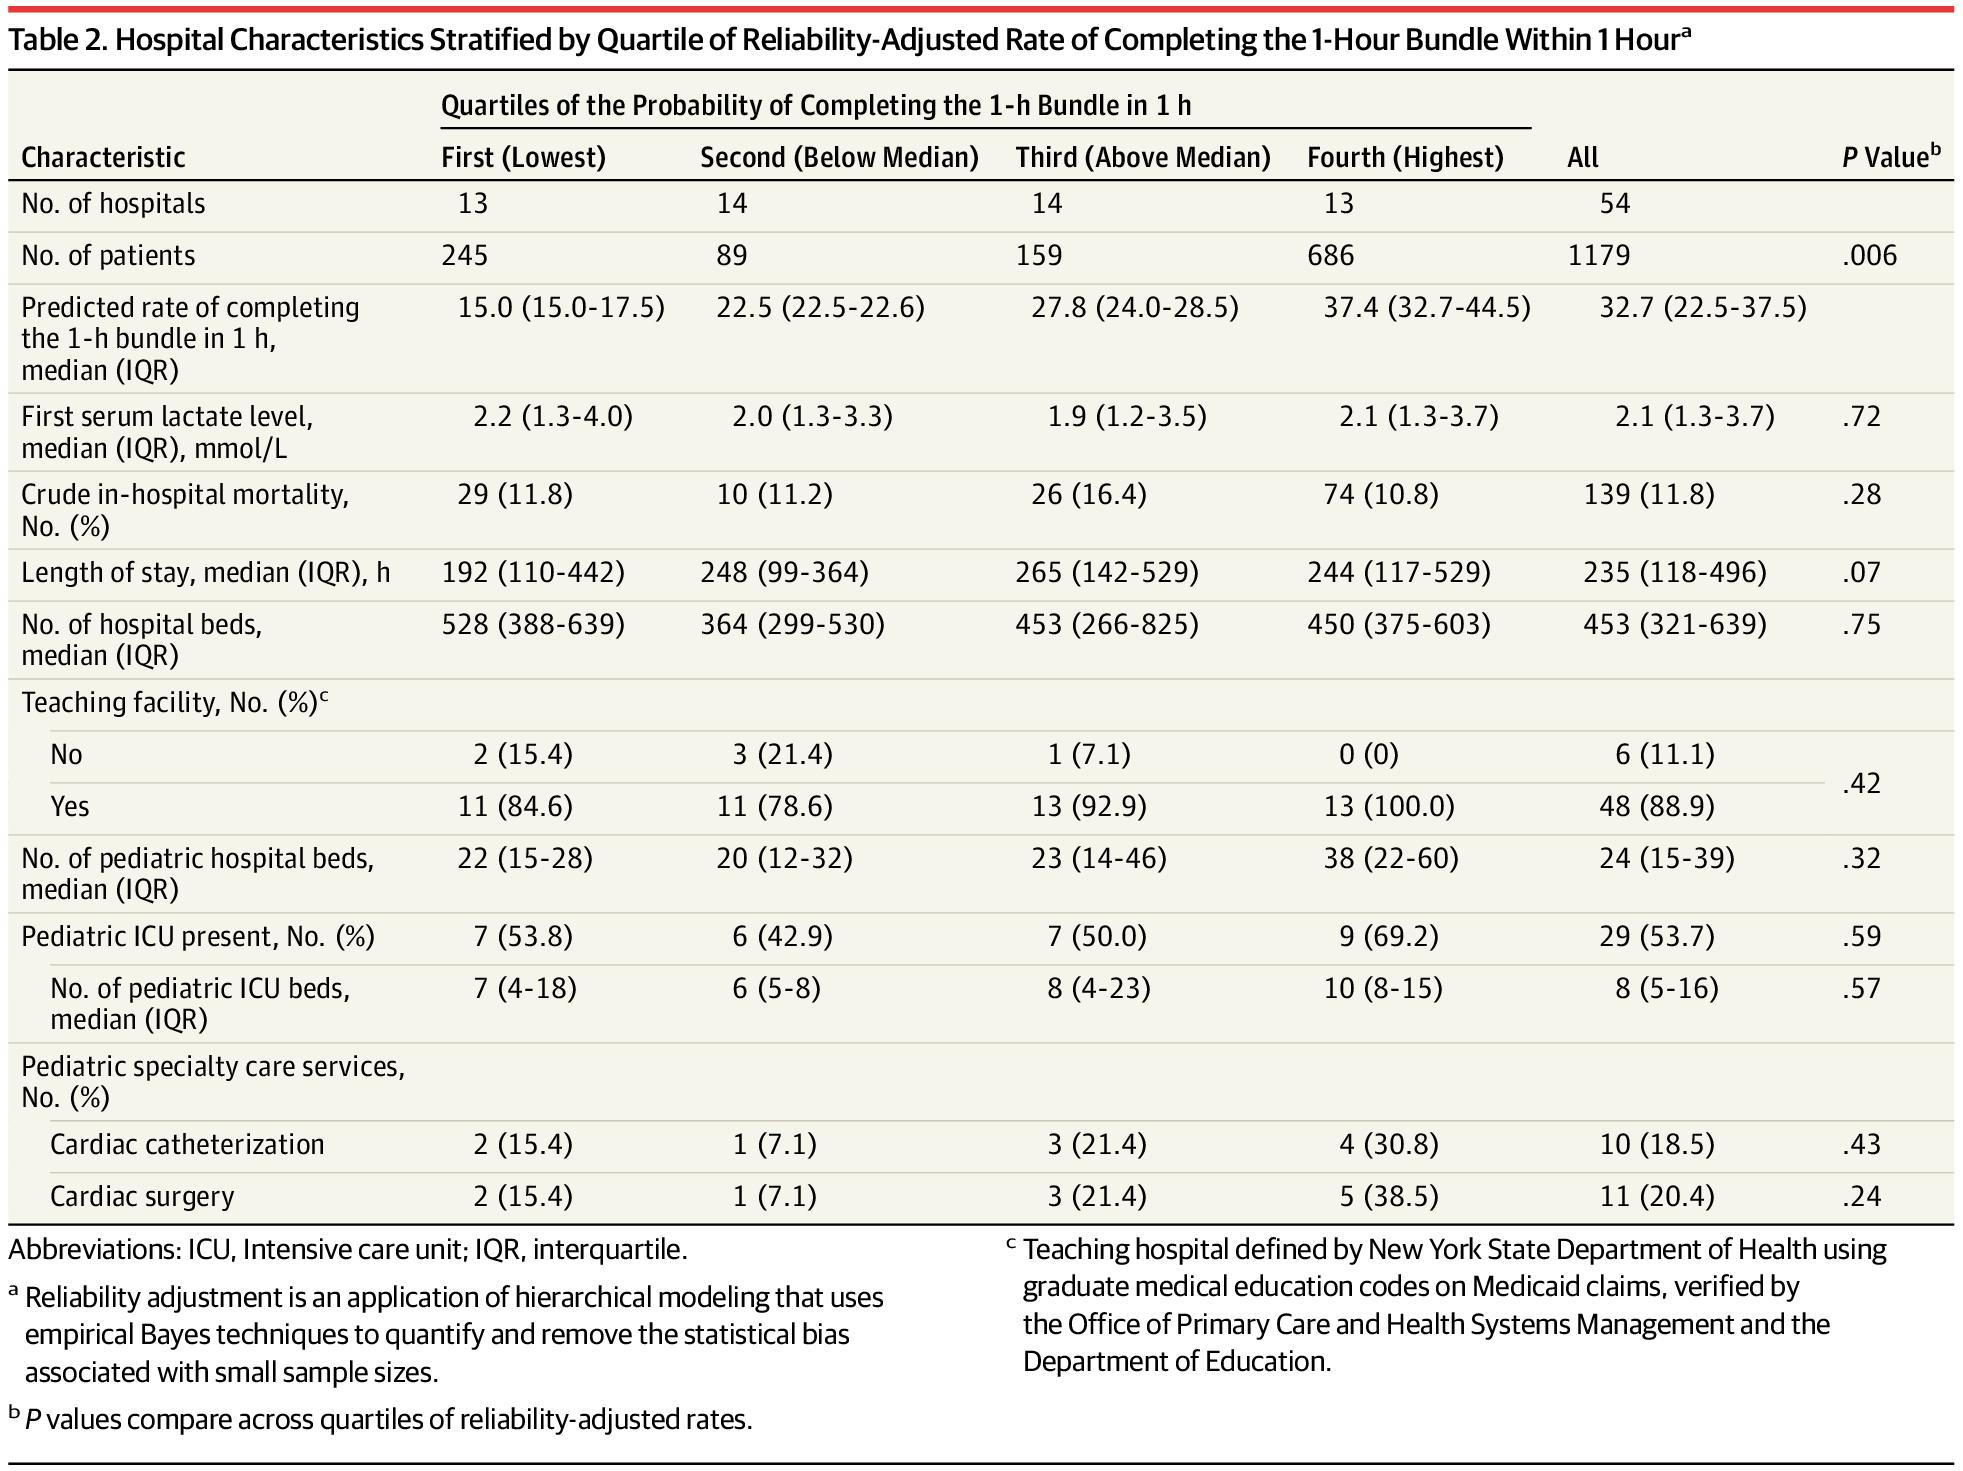 [JAMA最新论文]:纽约全身性感染强制治疗措施与全身性感染患儿住院病死率的相关性